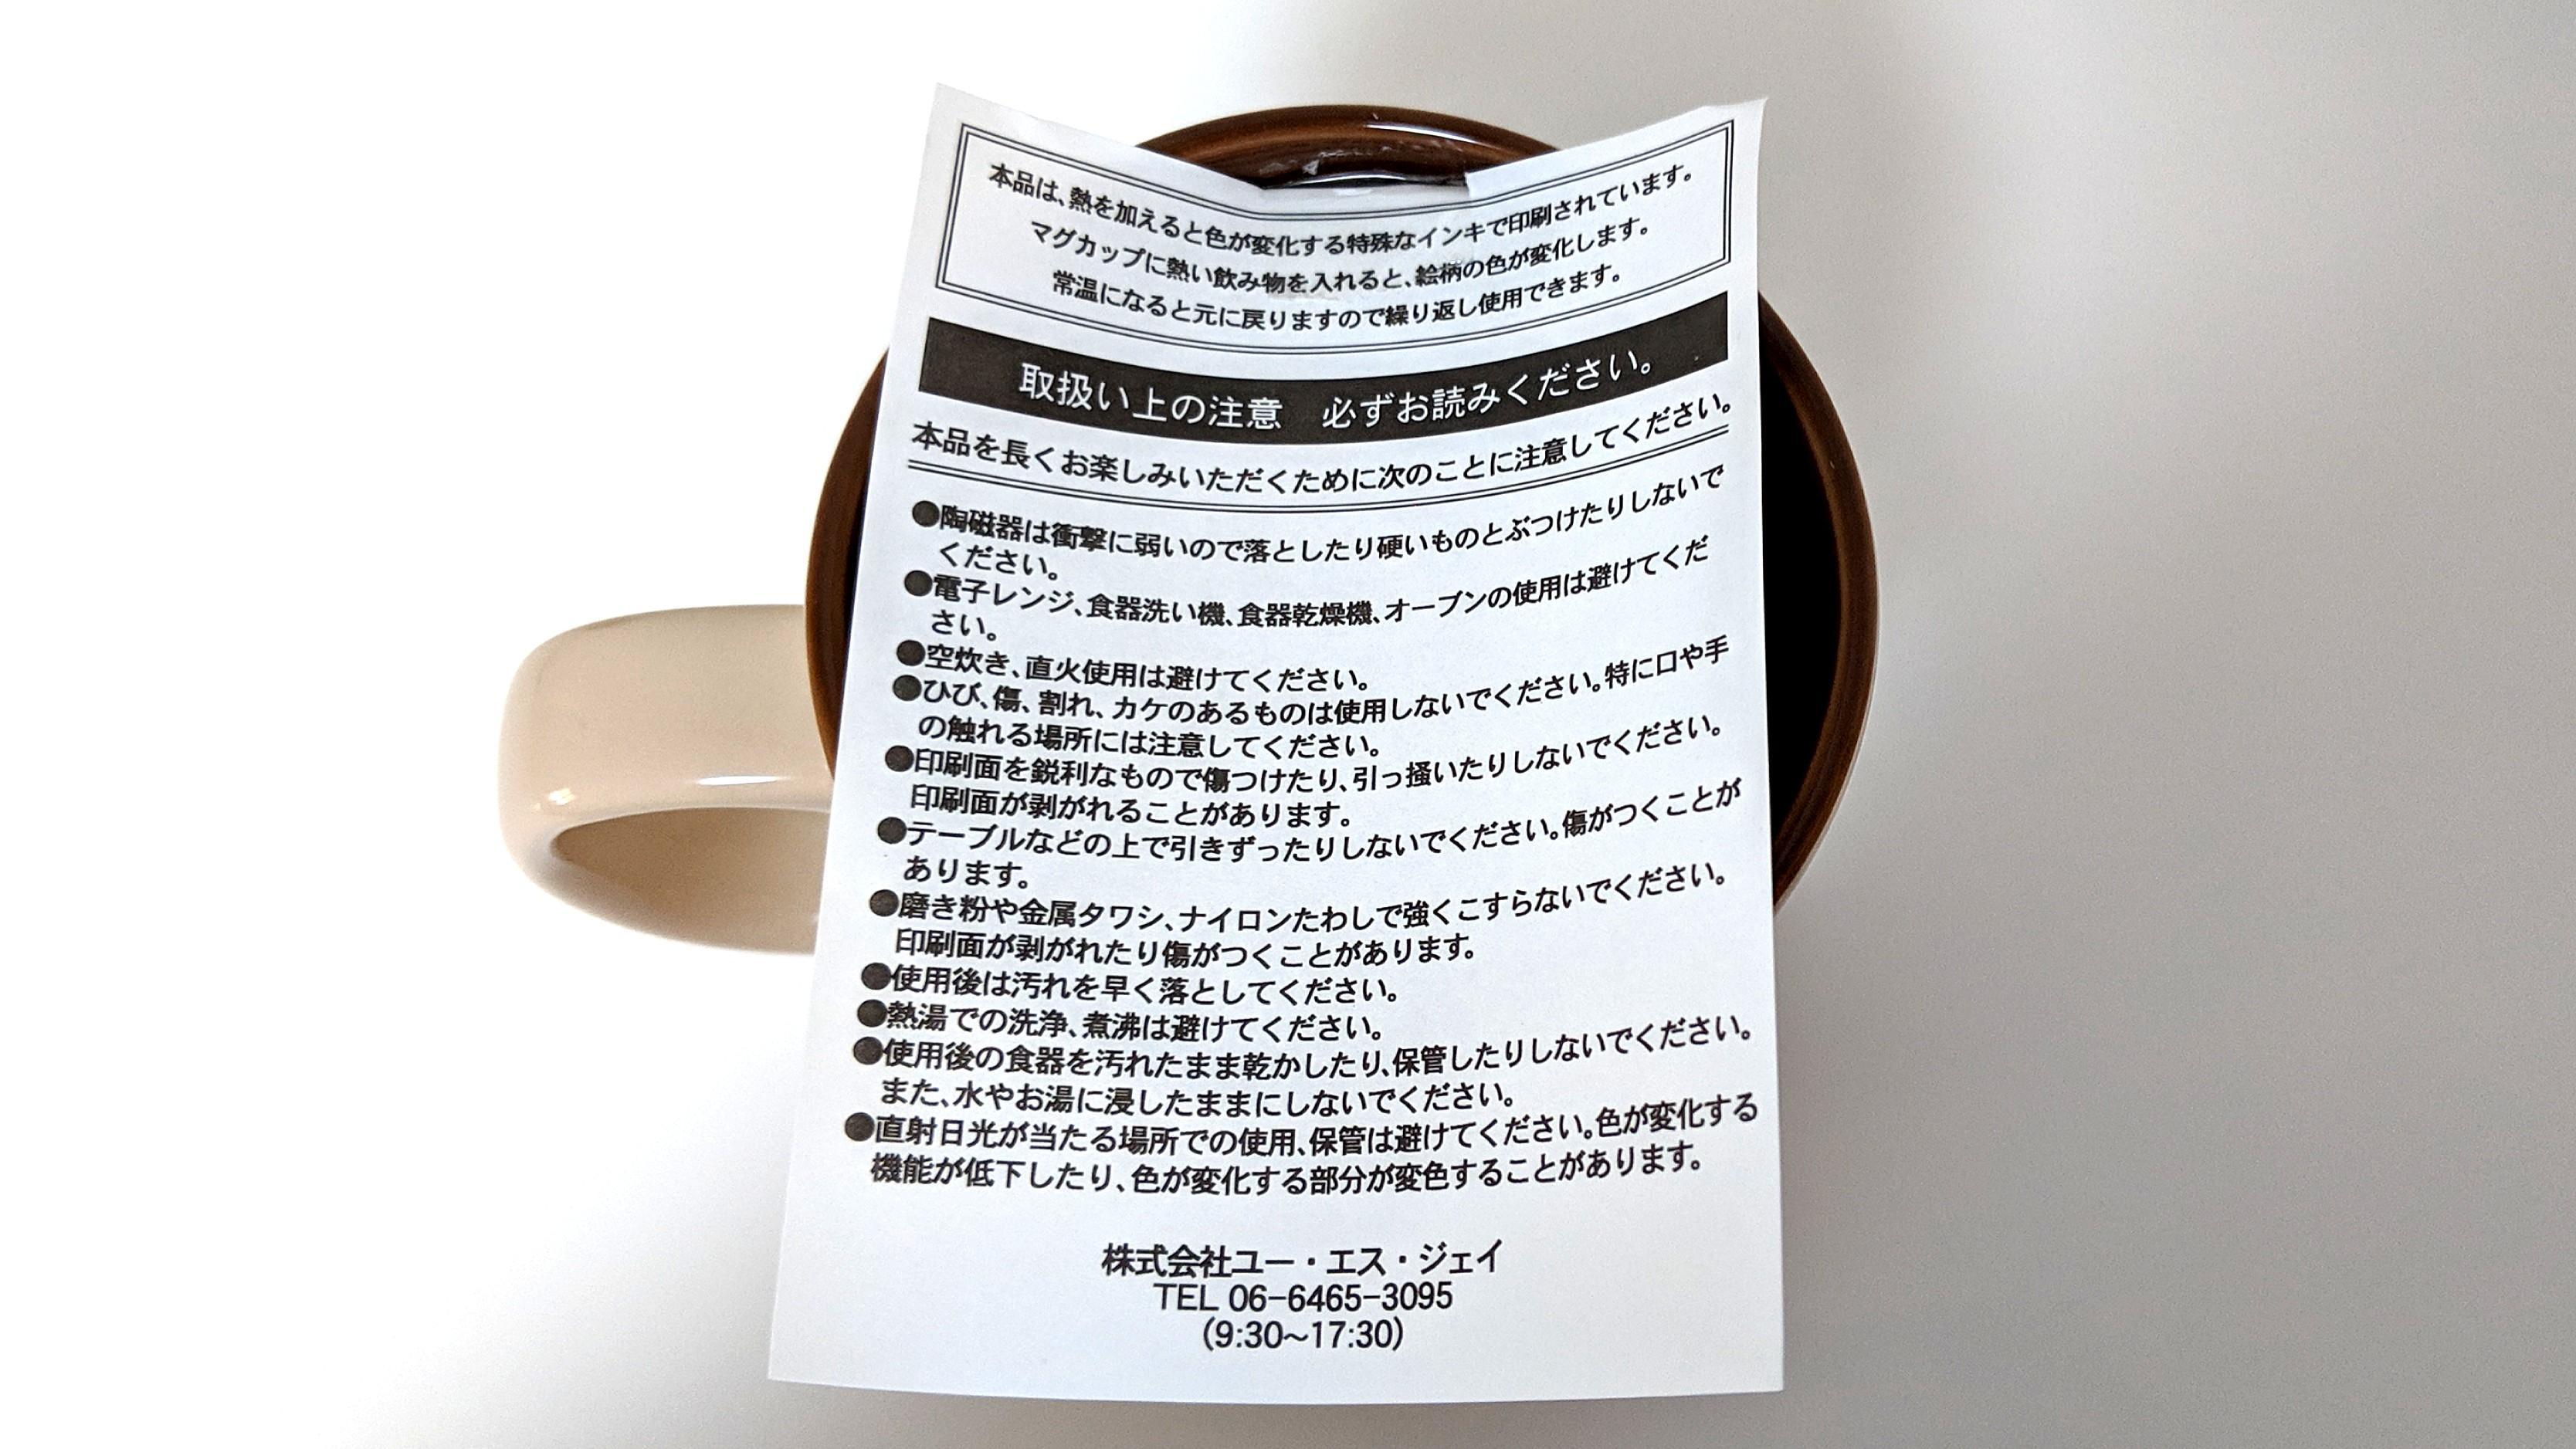 [NEW] The Maurauder's Map Mug from Universal Studios Japan (heat sensitive)